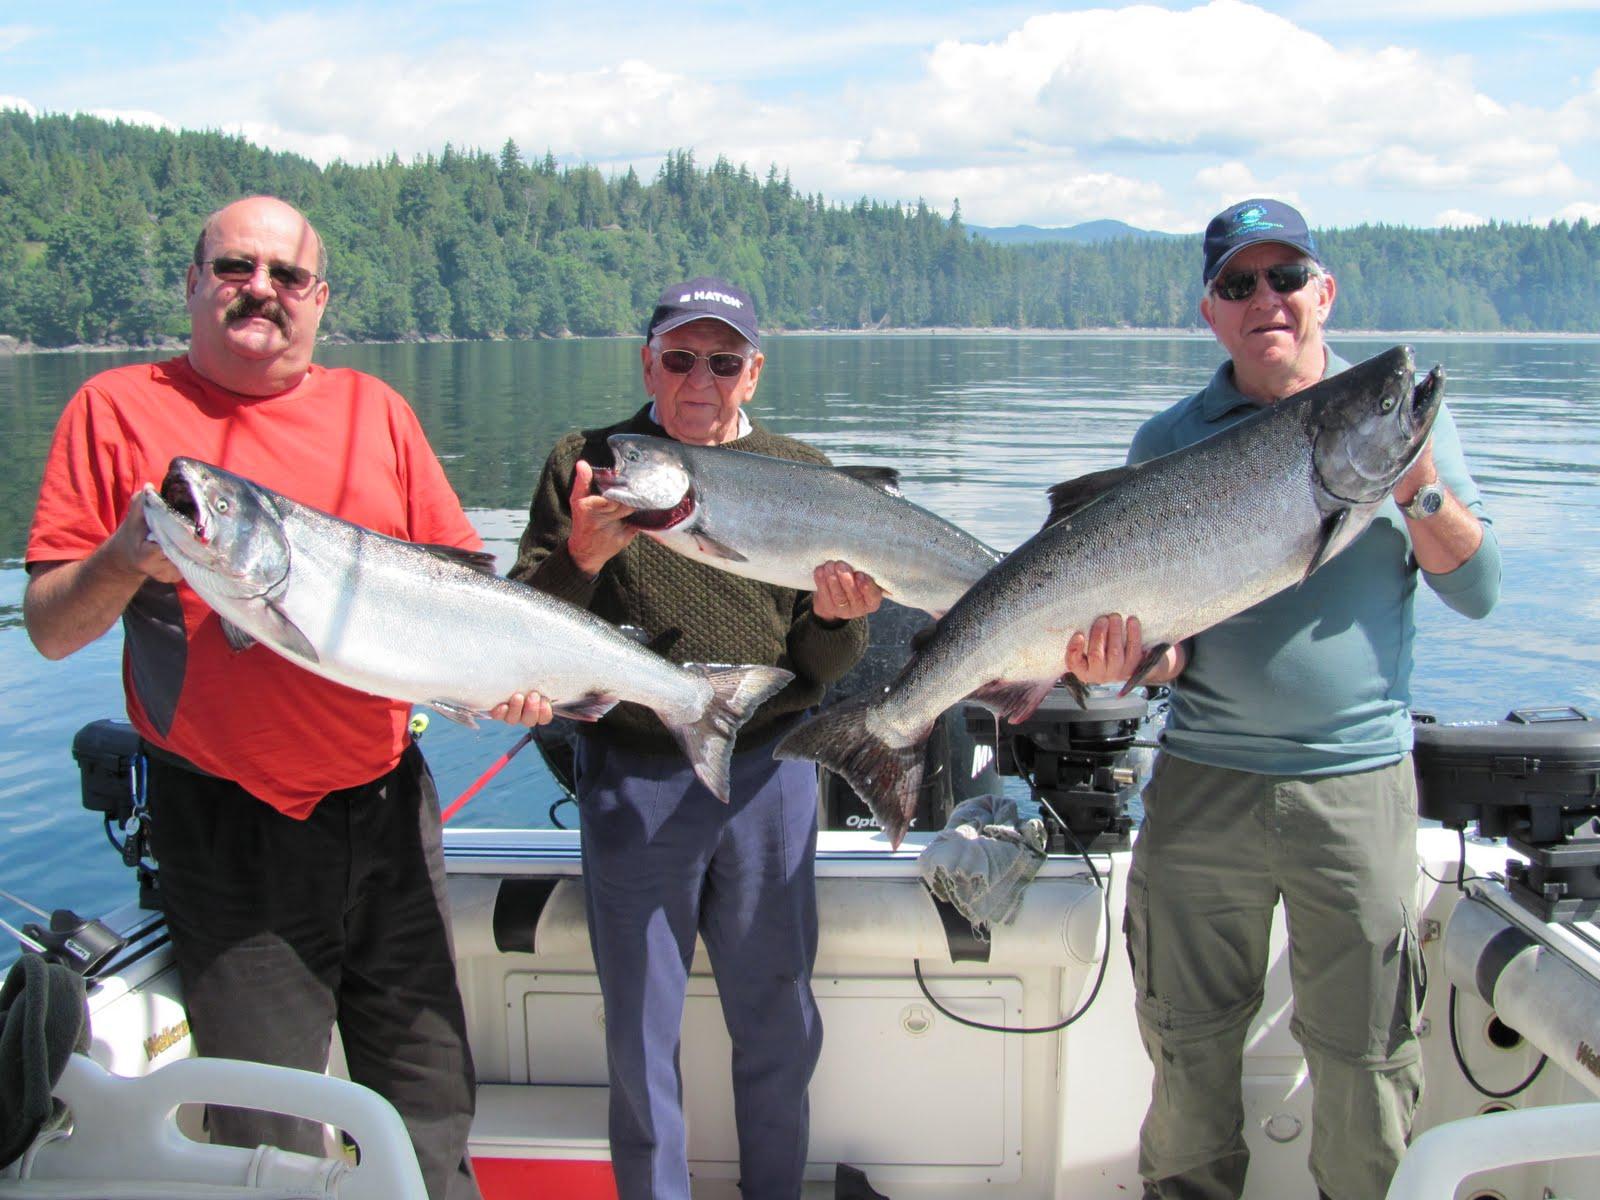 Fishing report sooke fishing adventures fantasic for Vancouver island fishing